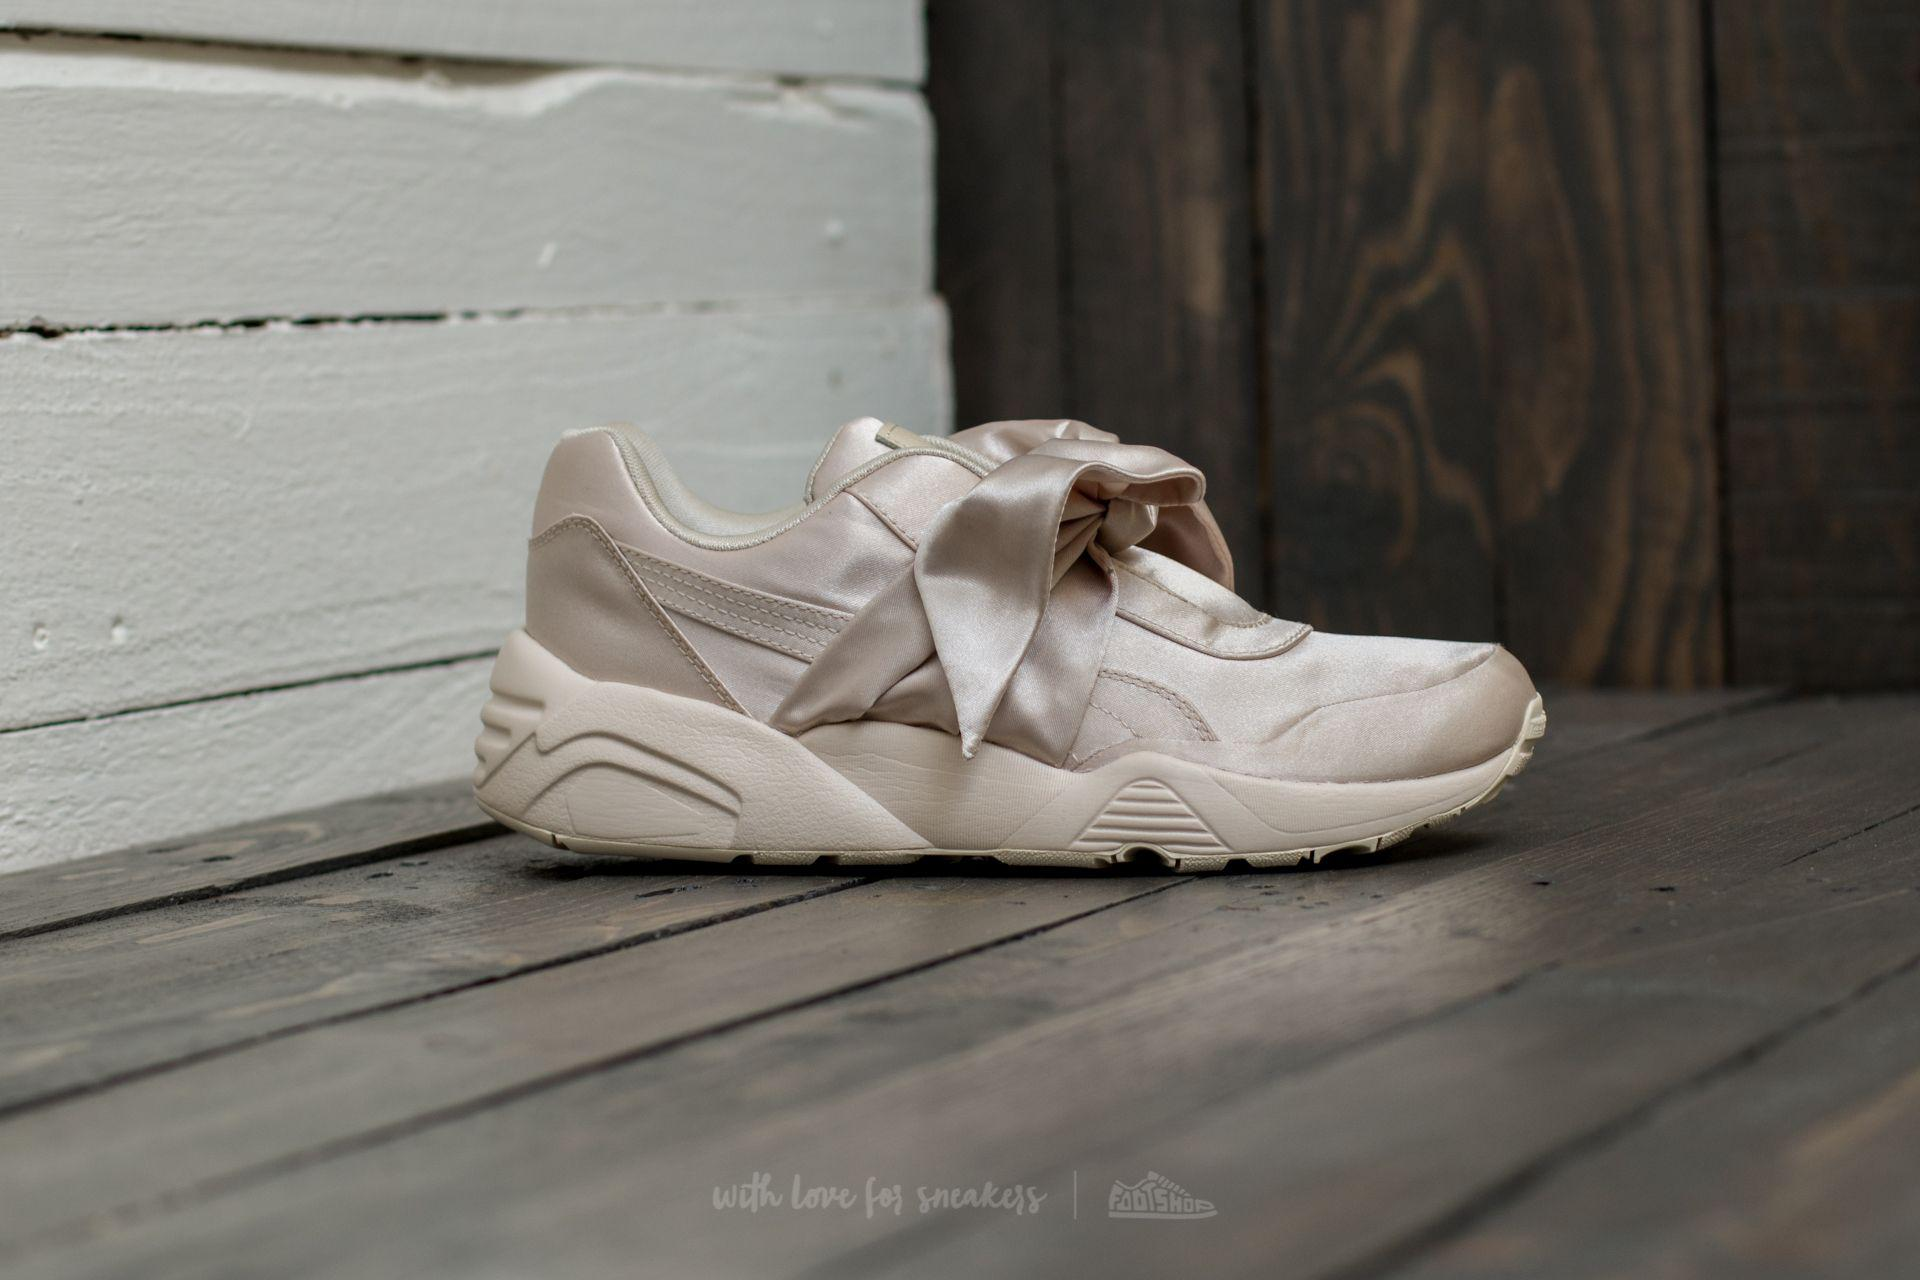 Lyst - Footshop Fenty X Rihanna Bow Sneaker Womens Pink Tint-pink ... b1d933827